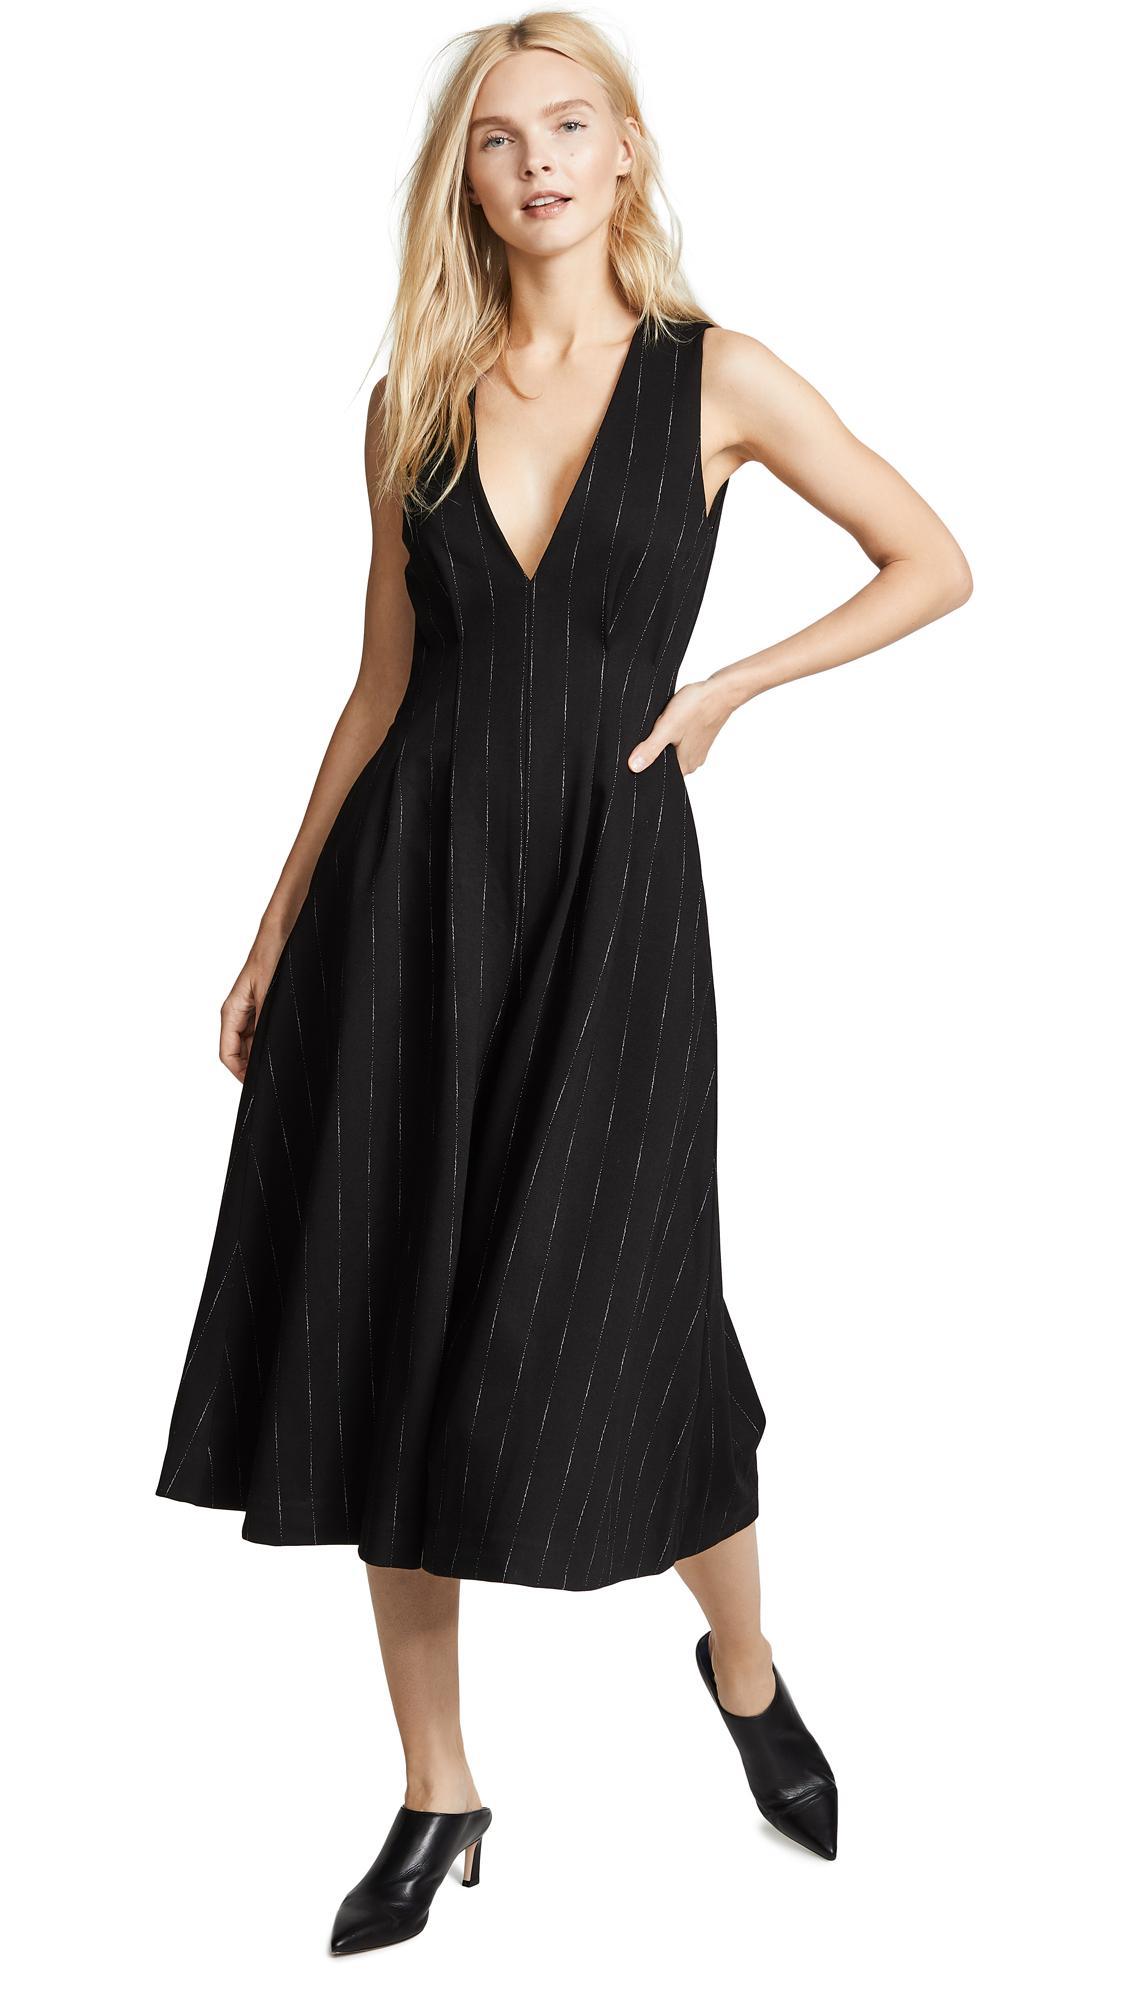 bf5fdd01874e Vatanika Pinstripe Jumpsuit In Black